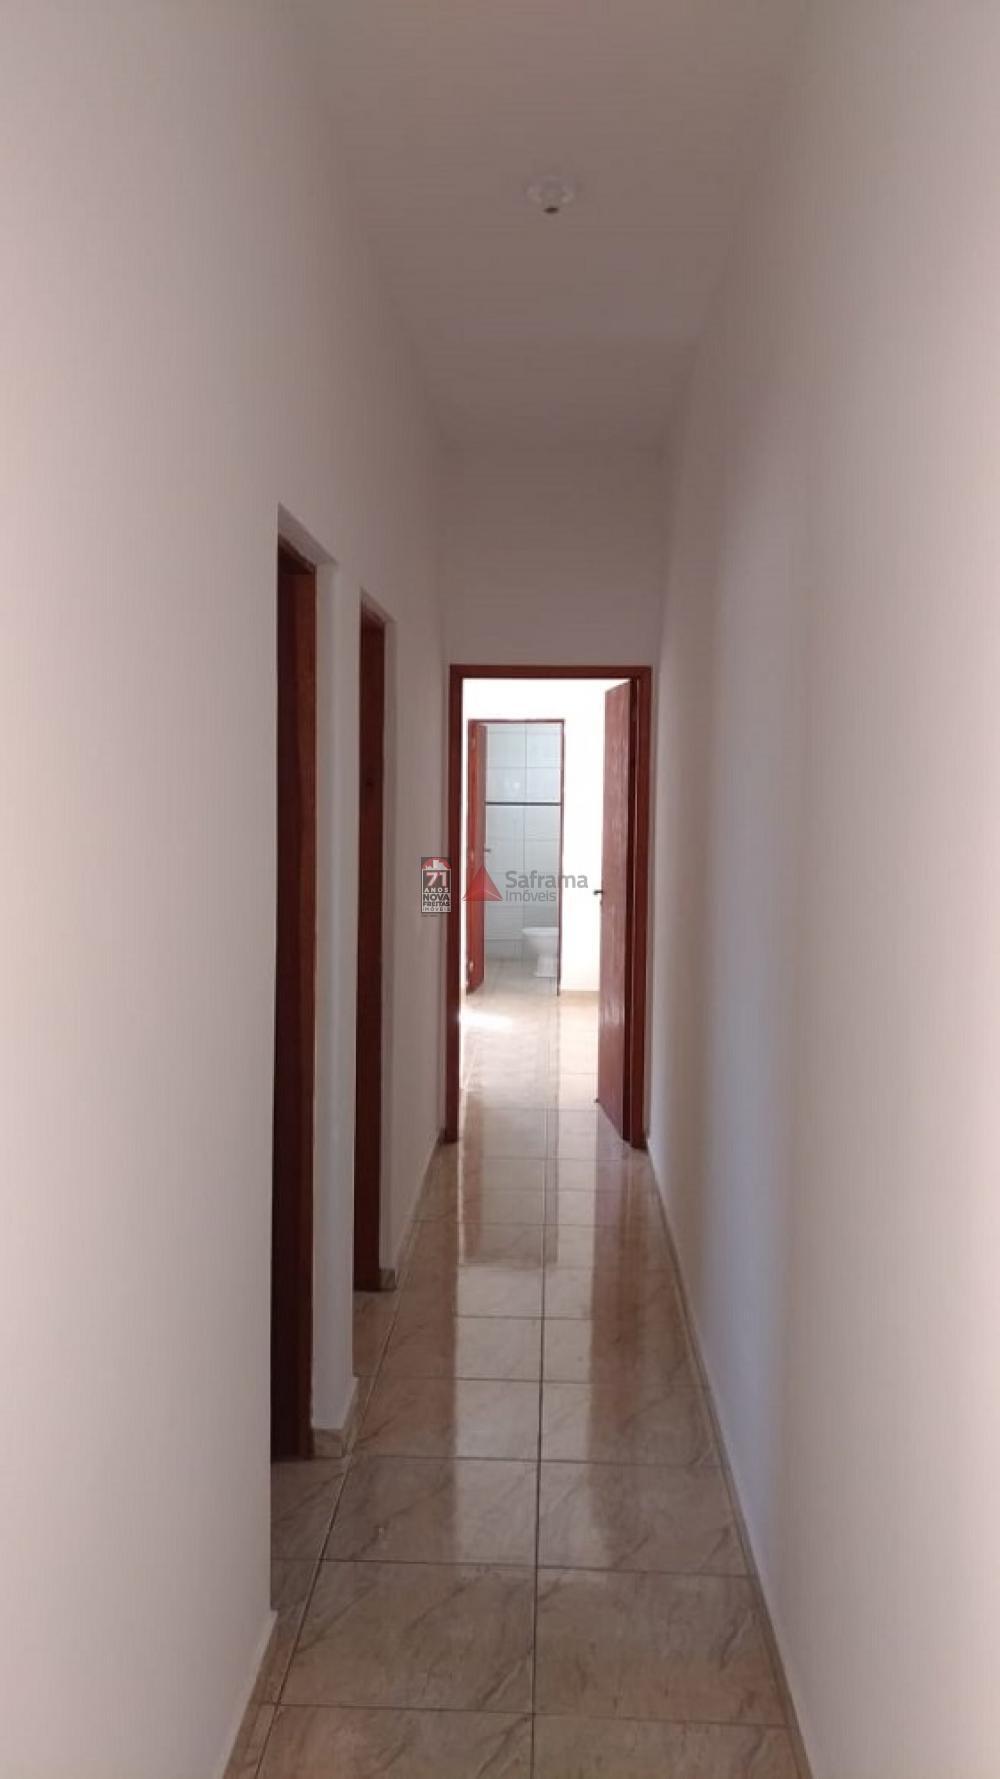 Comprar Casa / Padrão em Pindamonhangaba R$ 175.000,00 - Foto 3